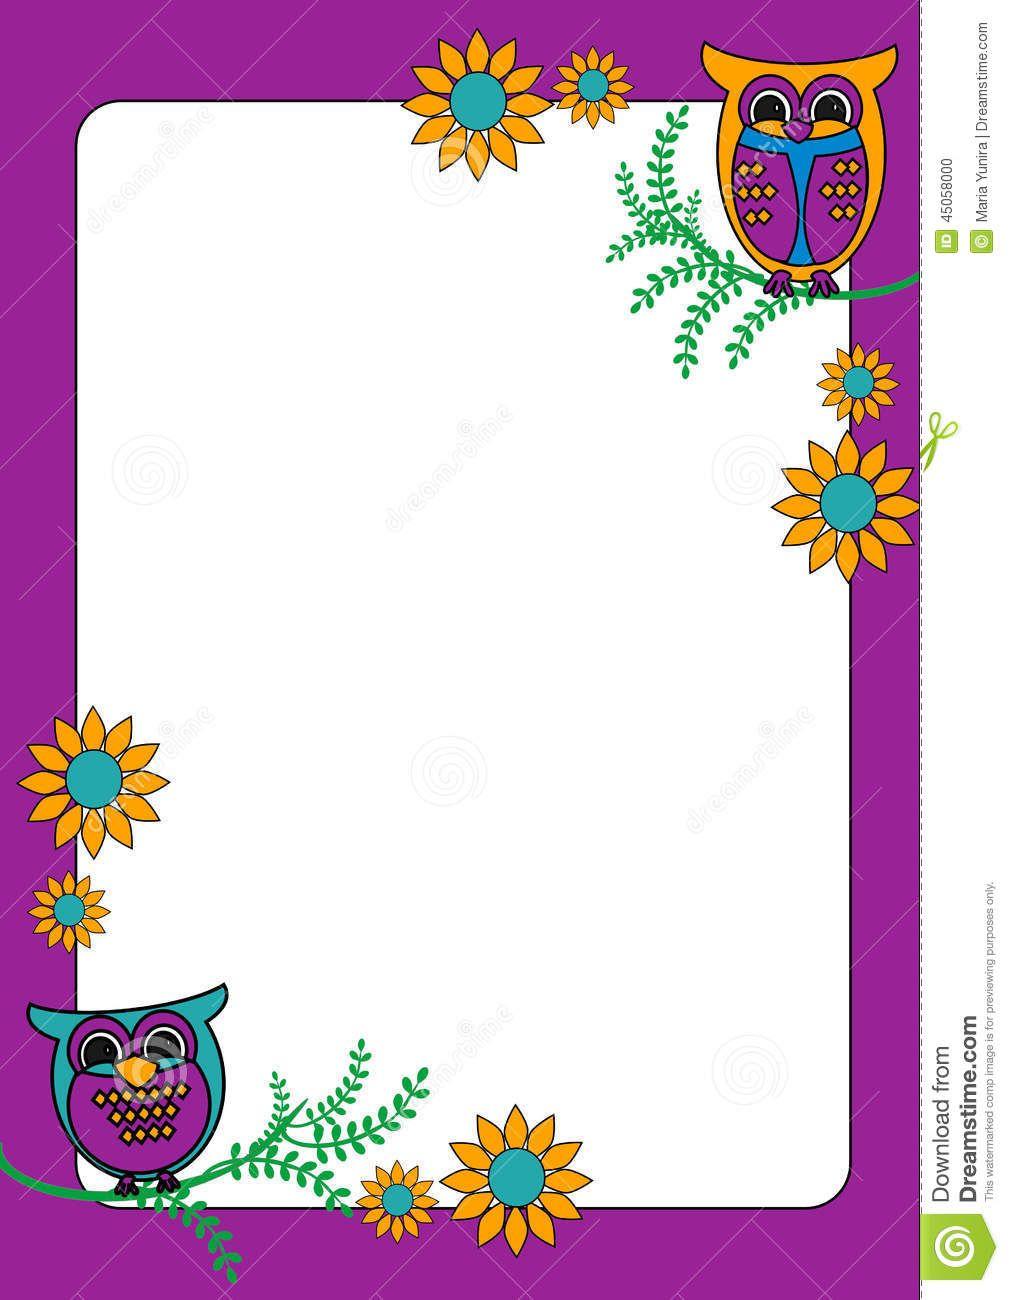 owl frame - Google Search | Marcos/Frame | Pinterest | Owl, Google ...